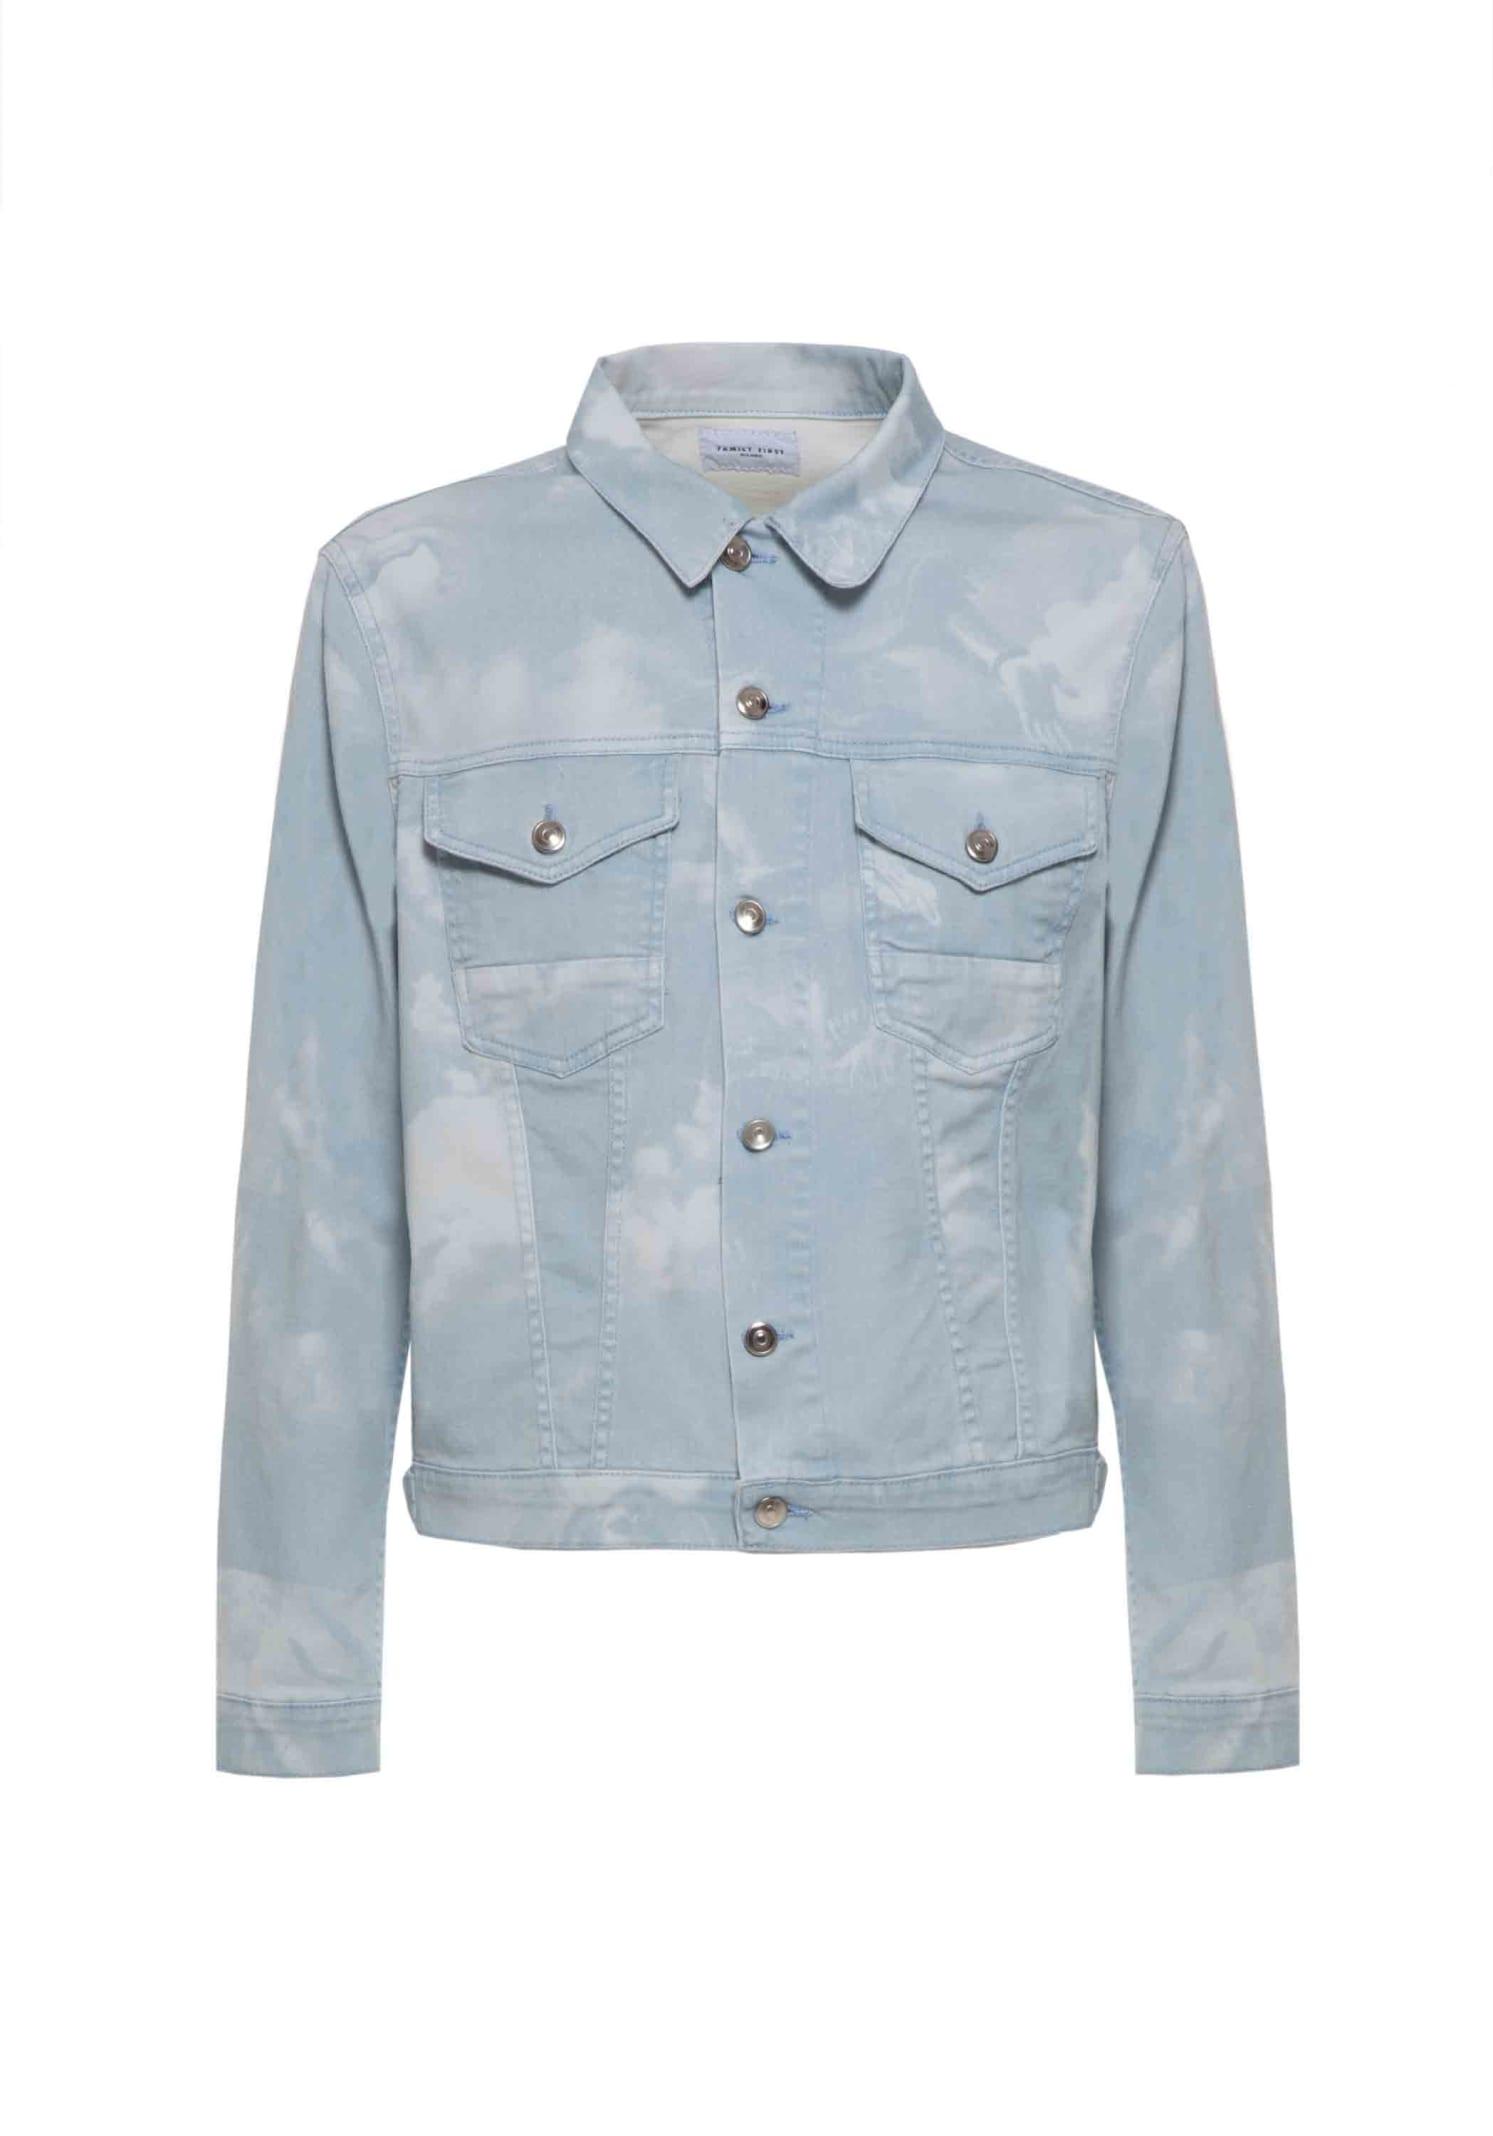 Jacket Denim The Saints Light Blue